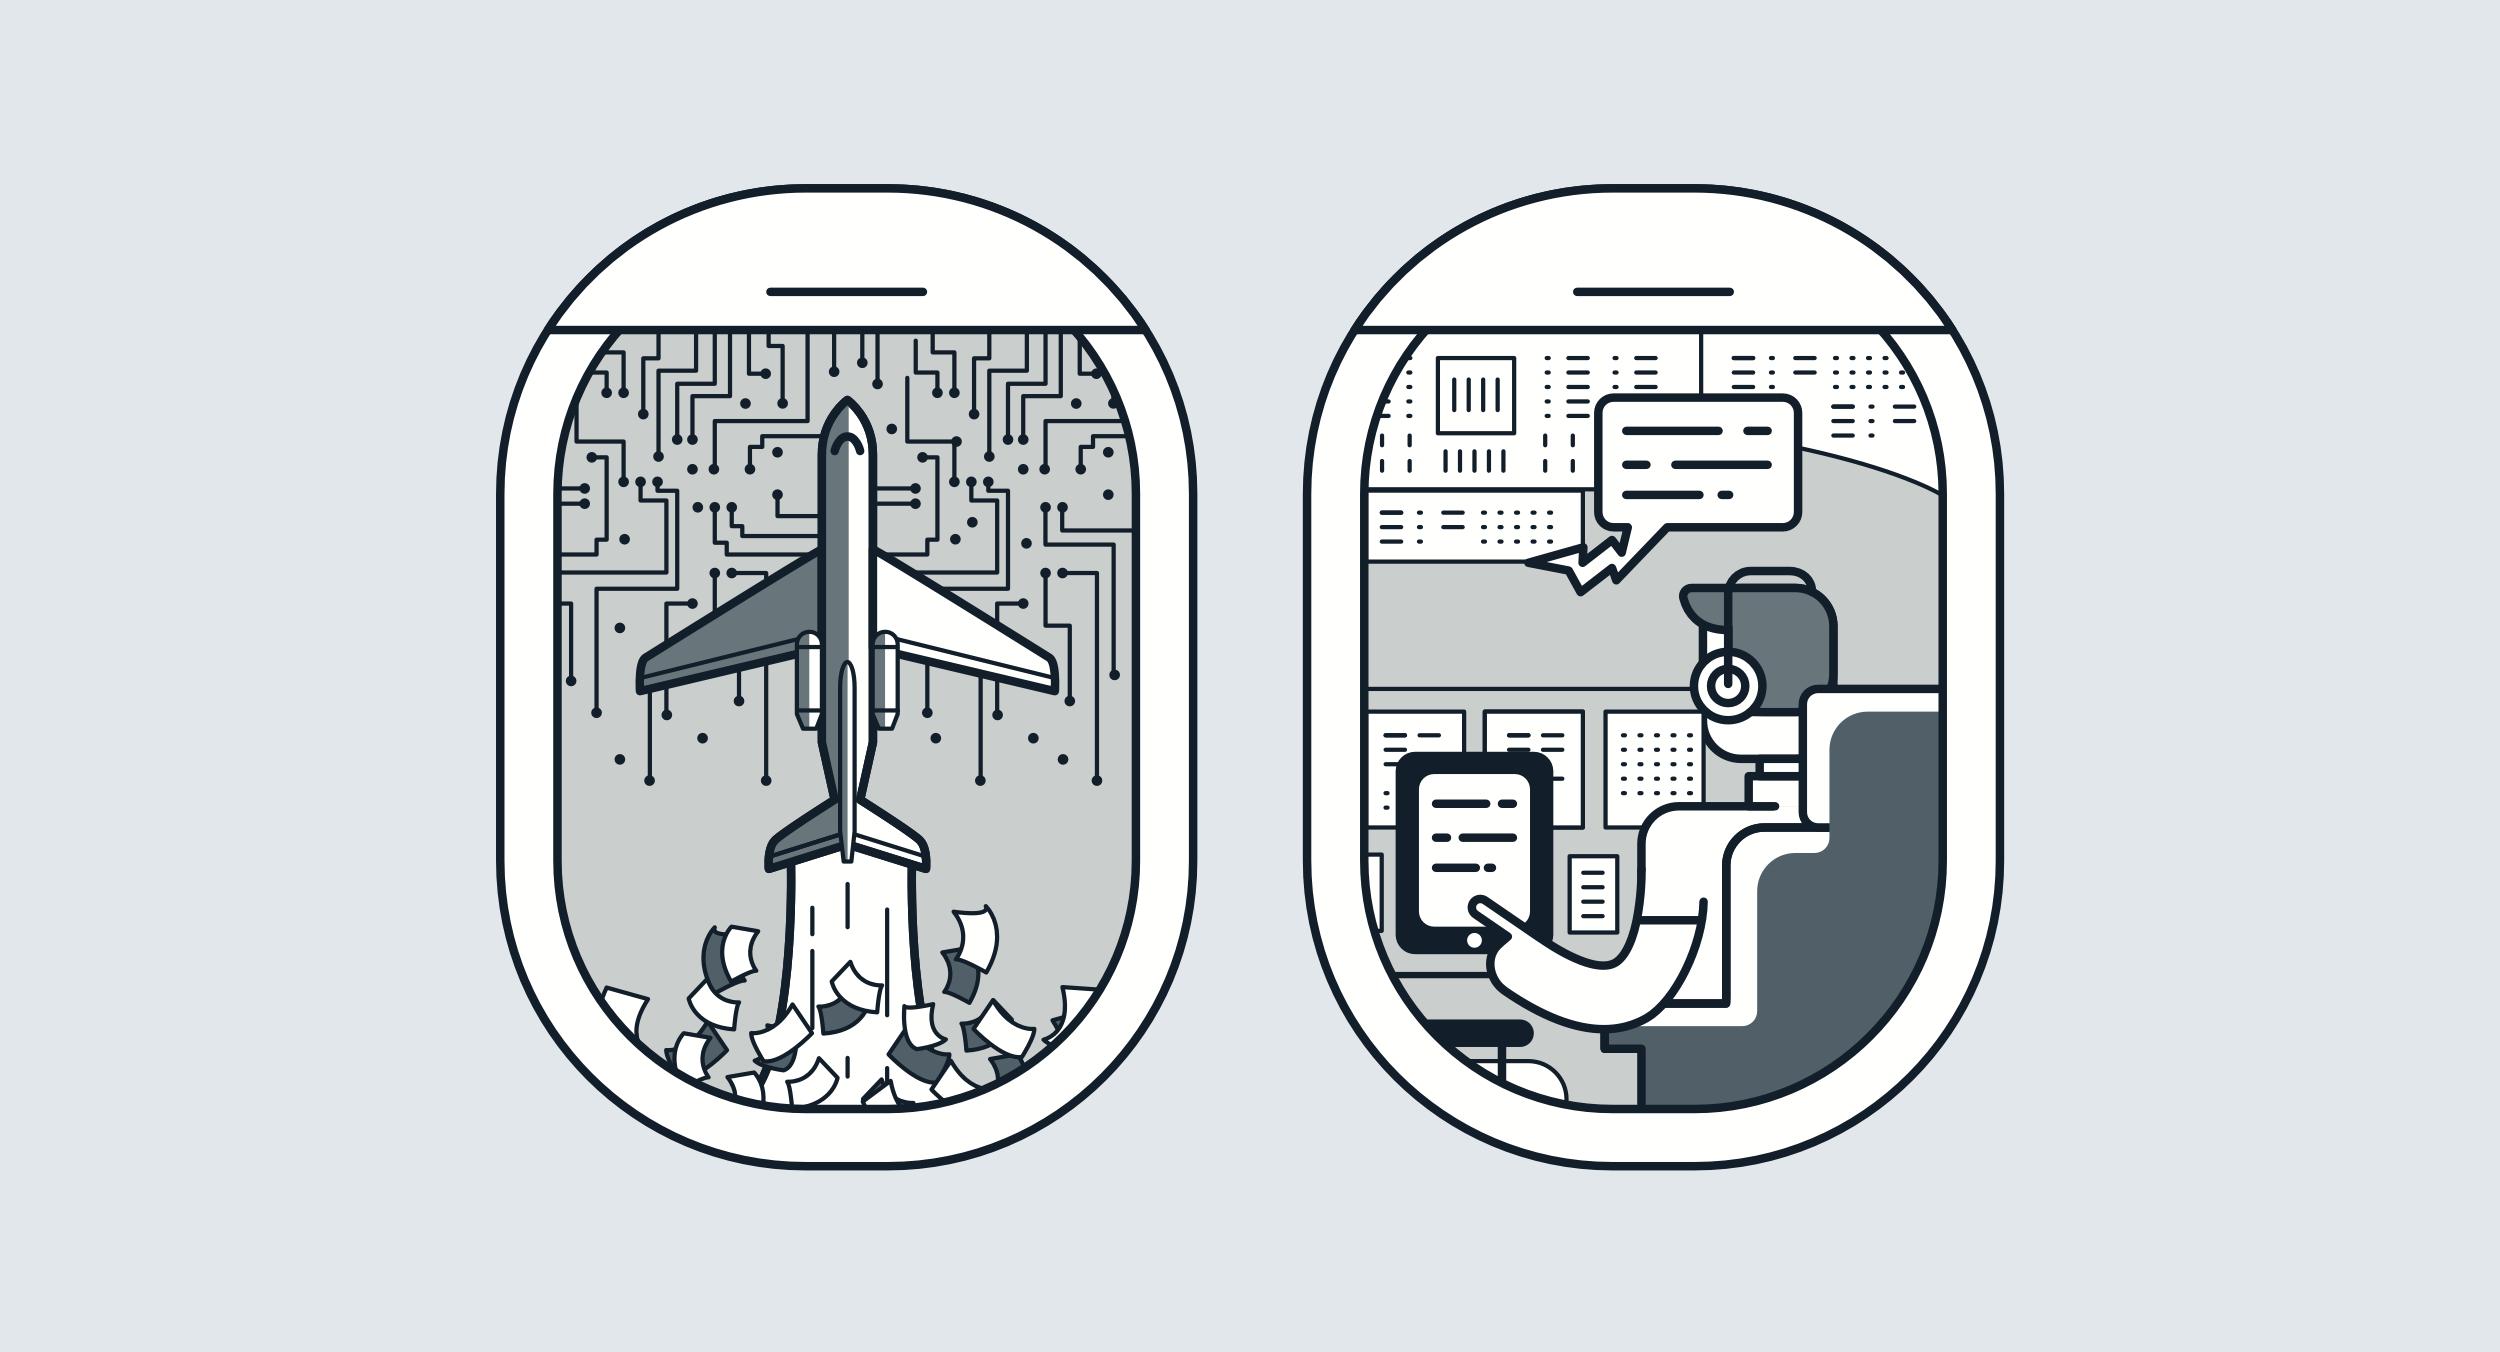 airplane_illustration carlosmenchaca.png